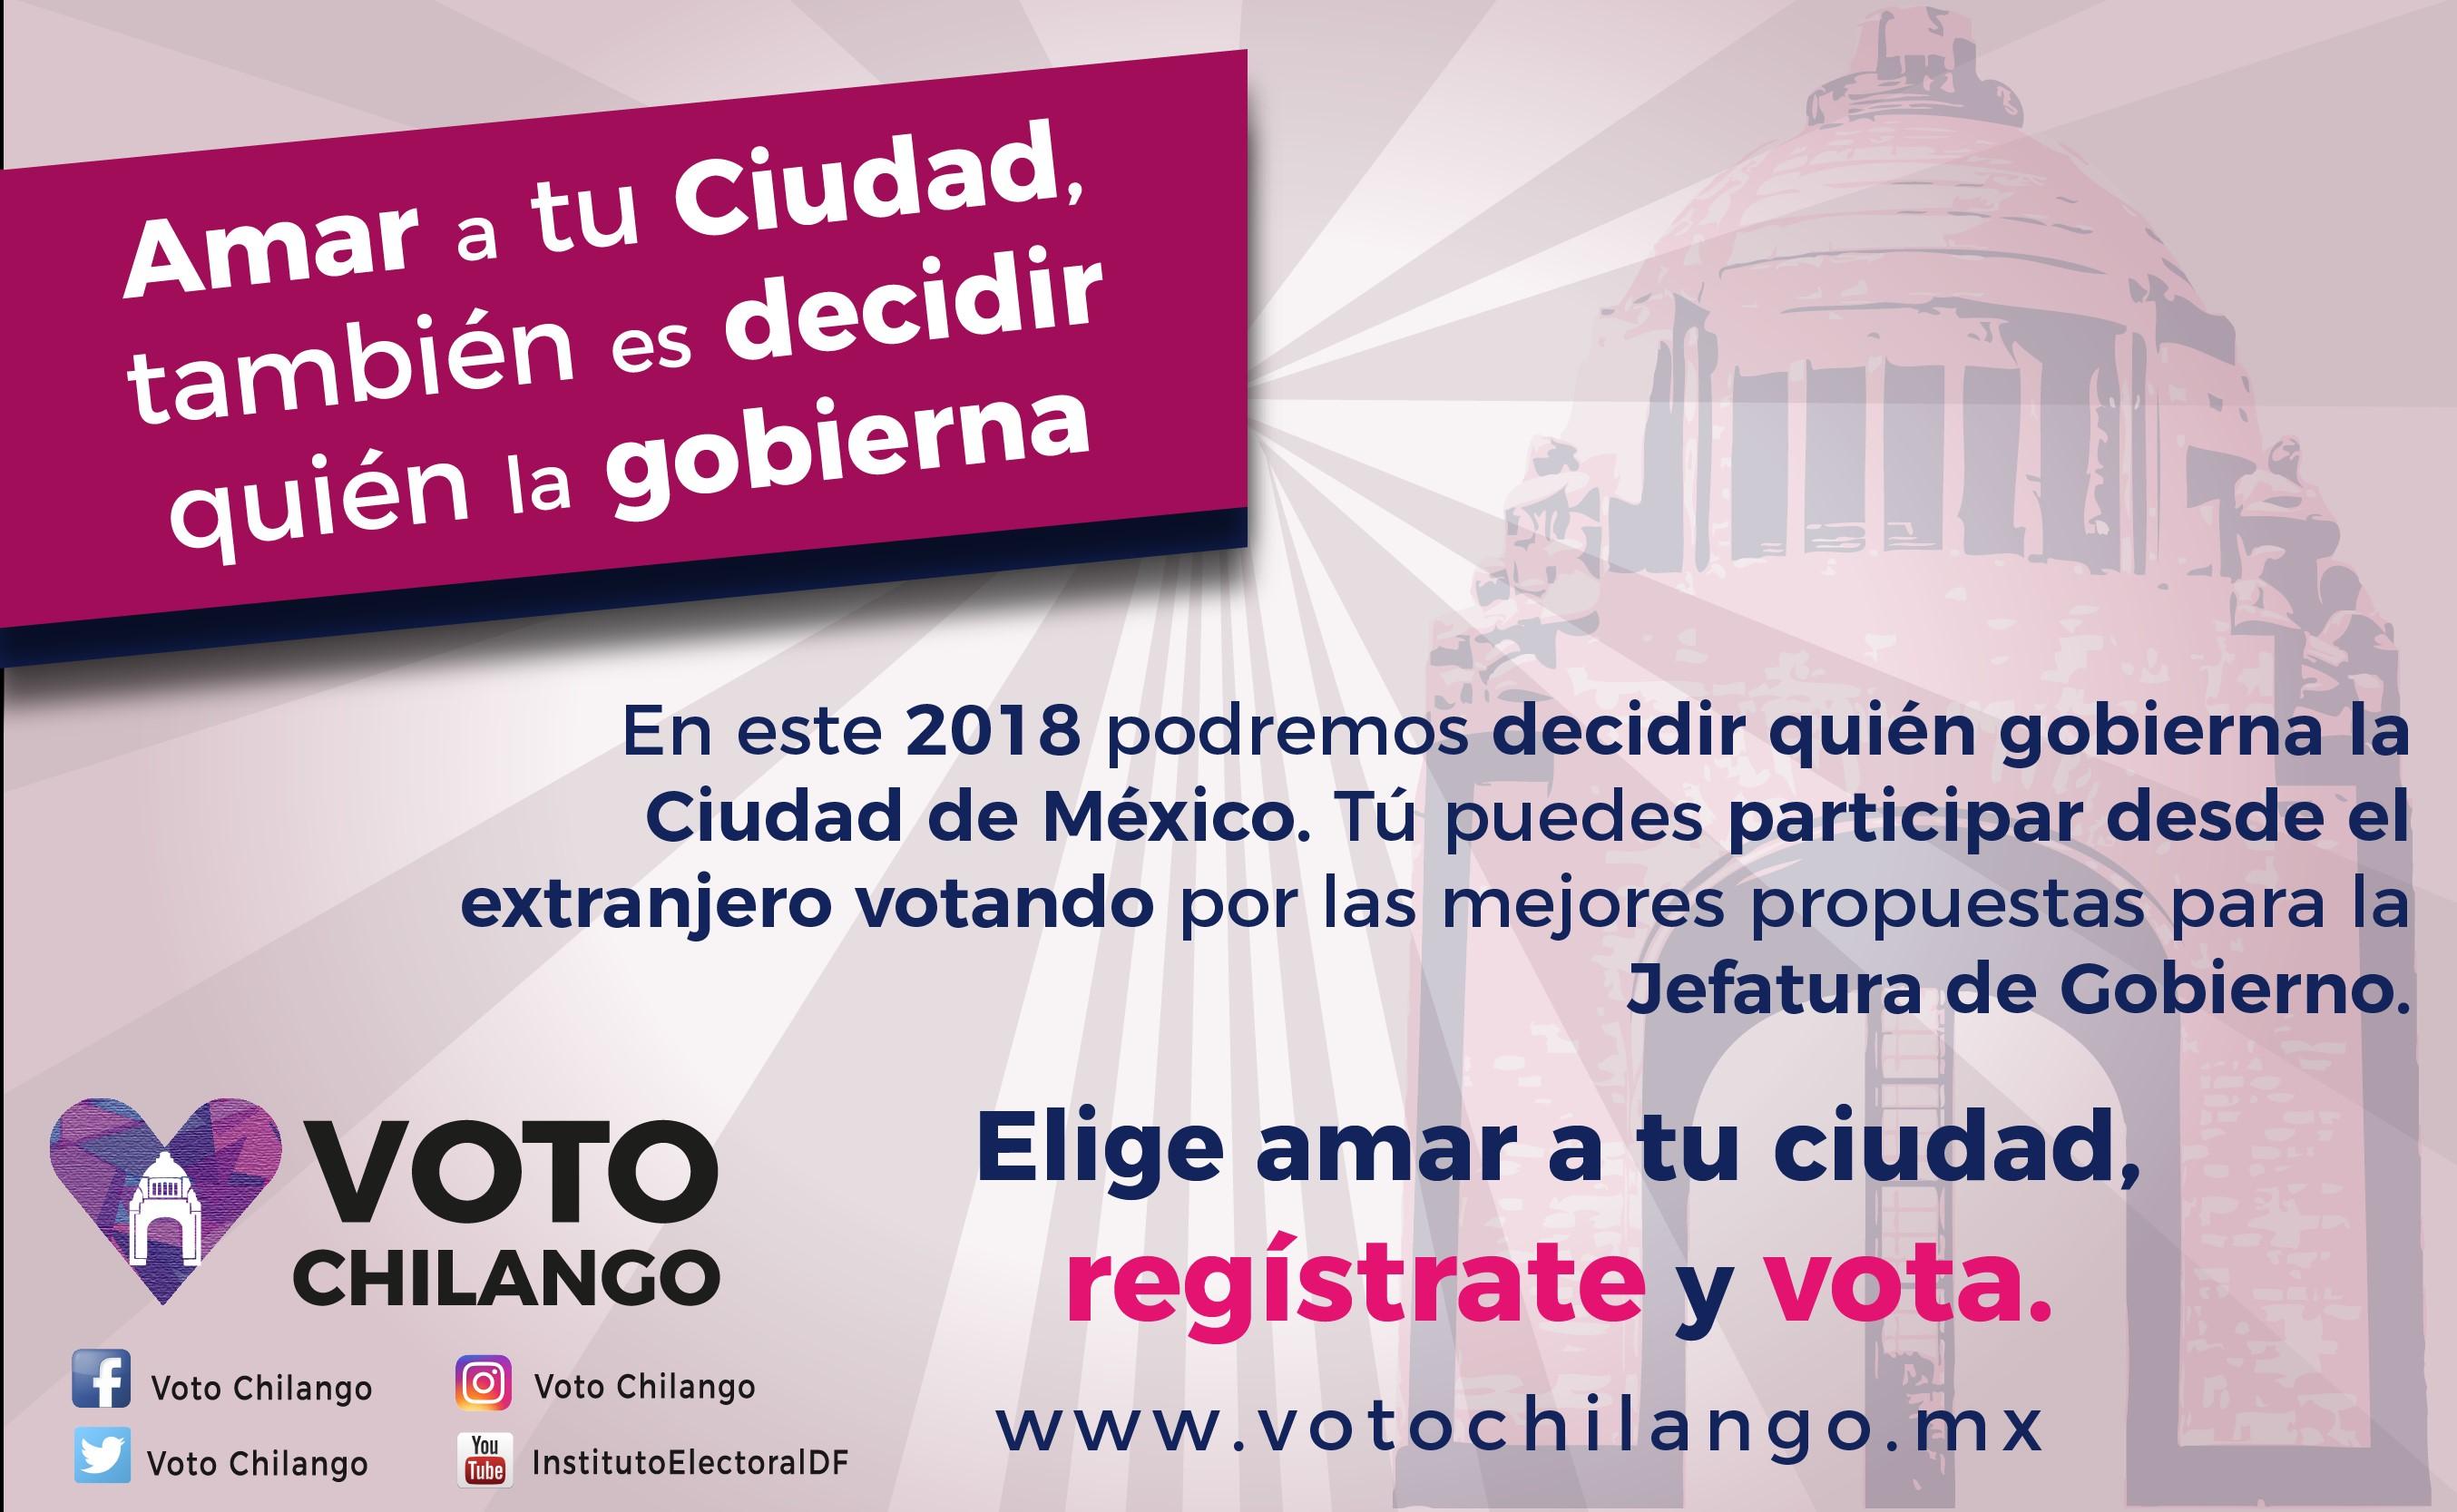 Voto Chilango!